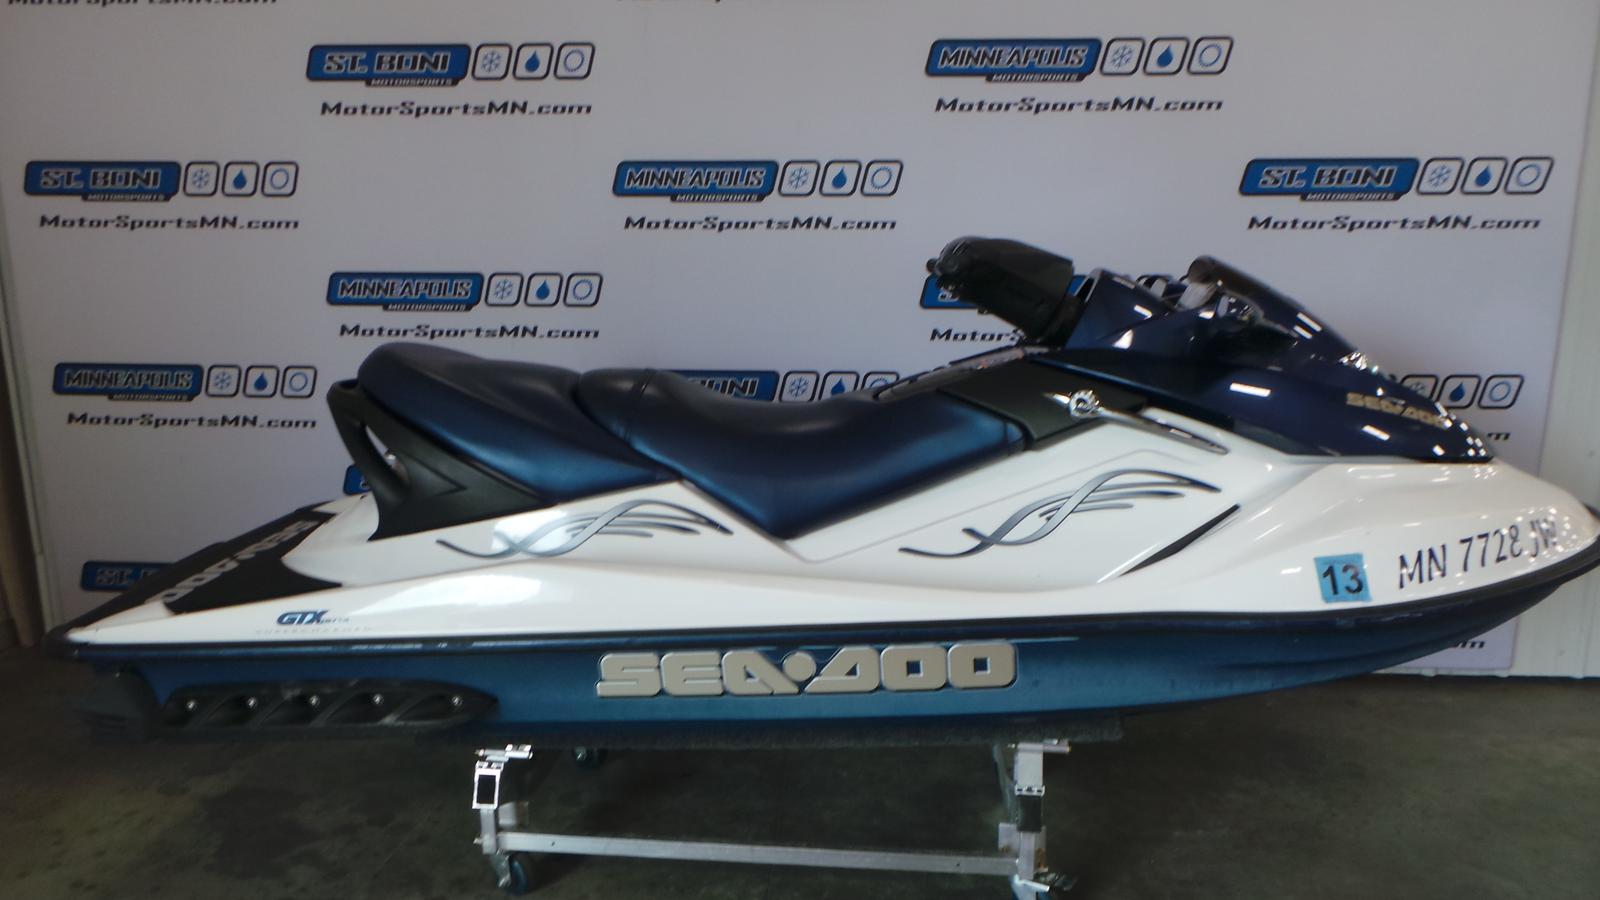 2005 Sea-Doo GTX 4-TEC 1503BV BU 05